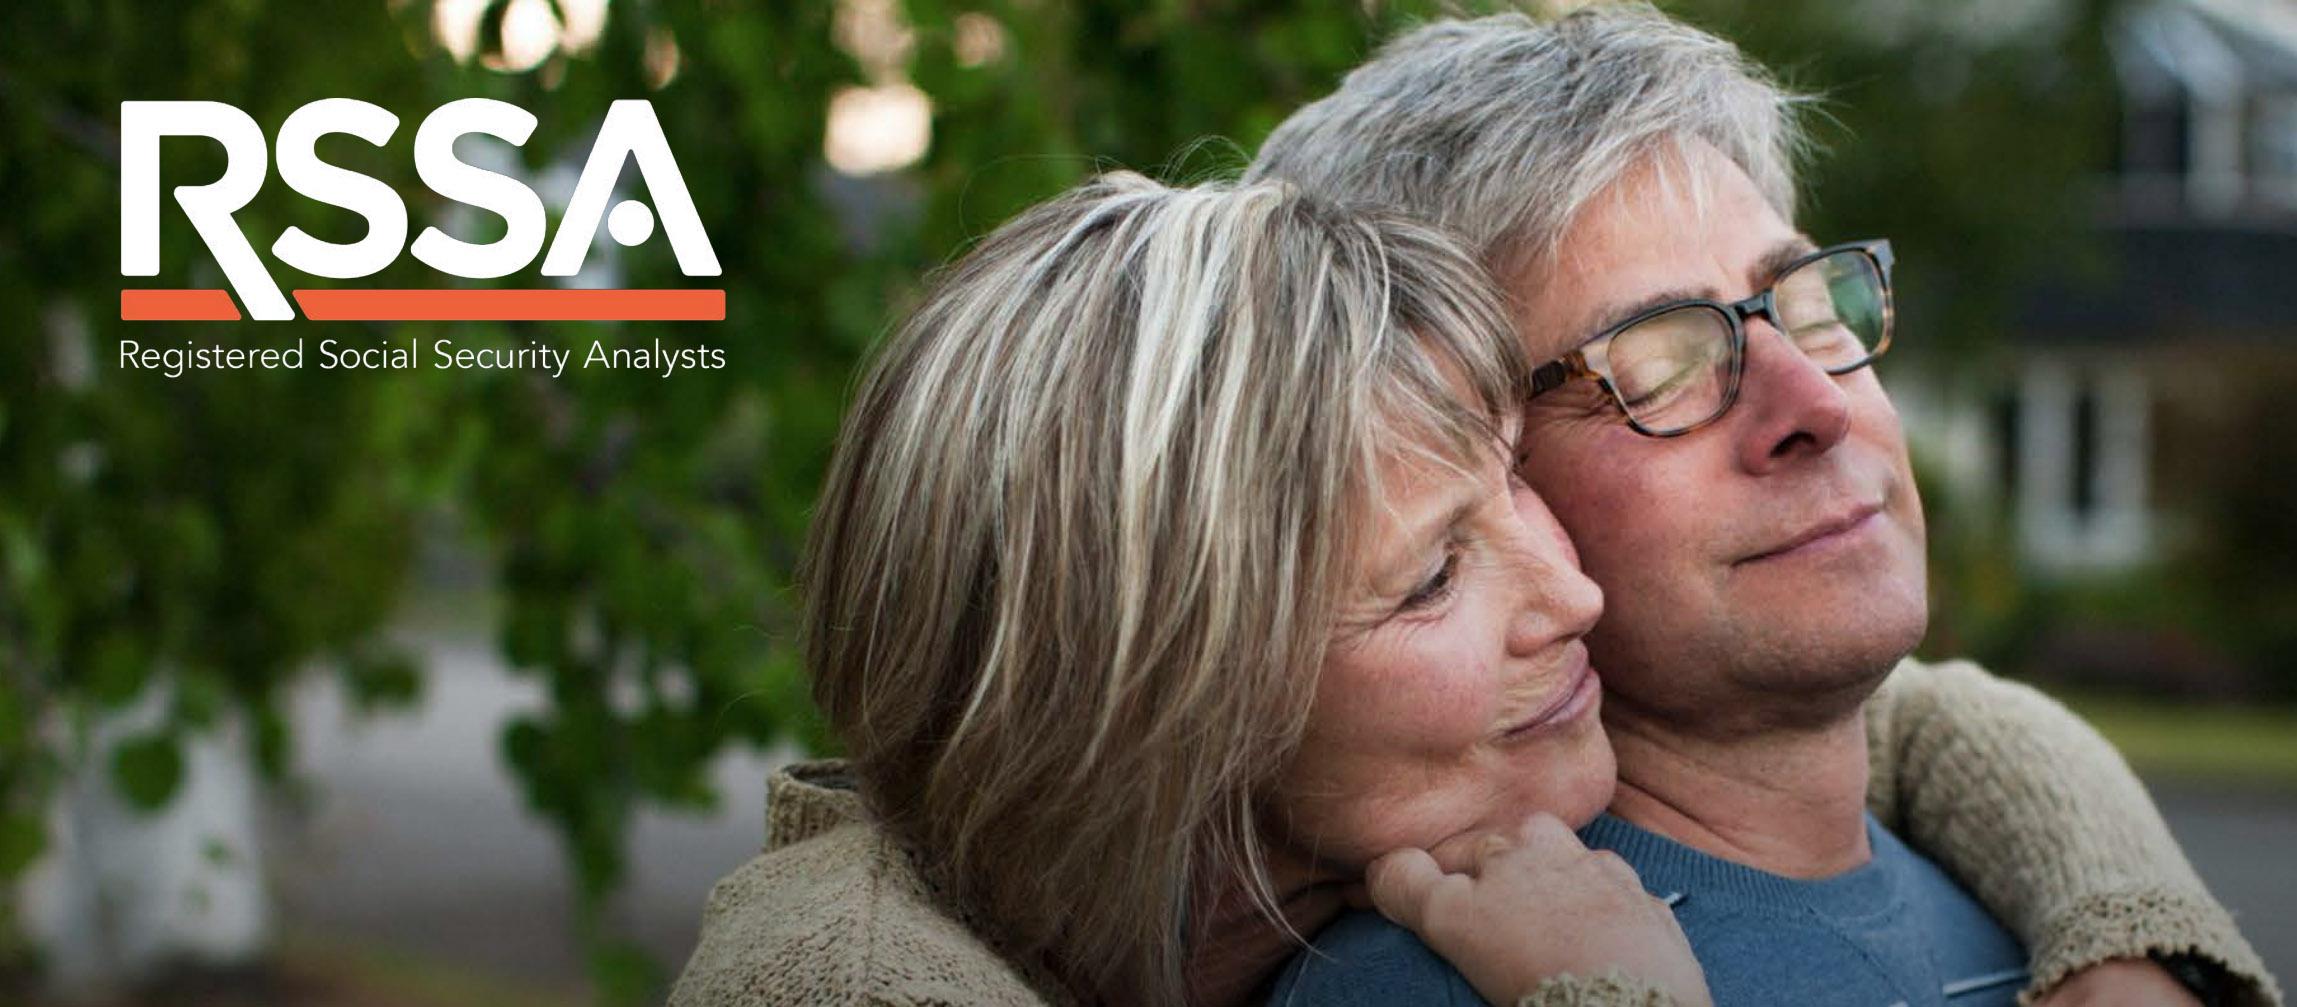 Registered Social Security Financial Benefits Advisor, Analyst, Omaha NE